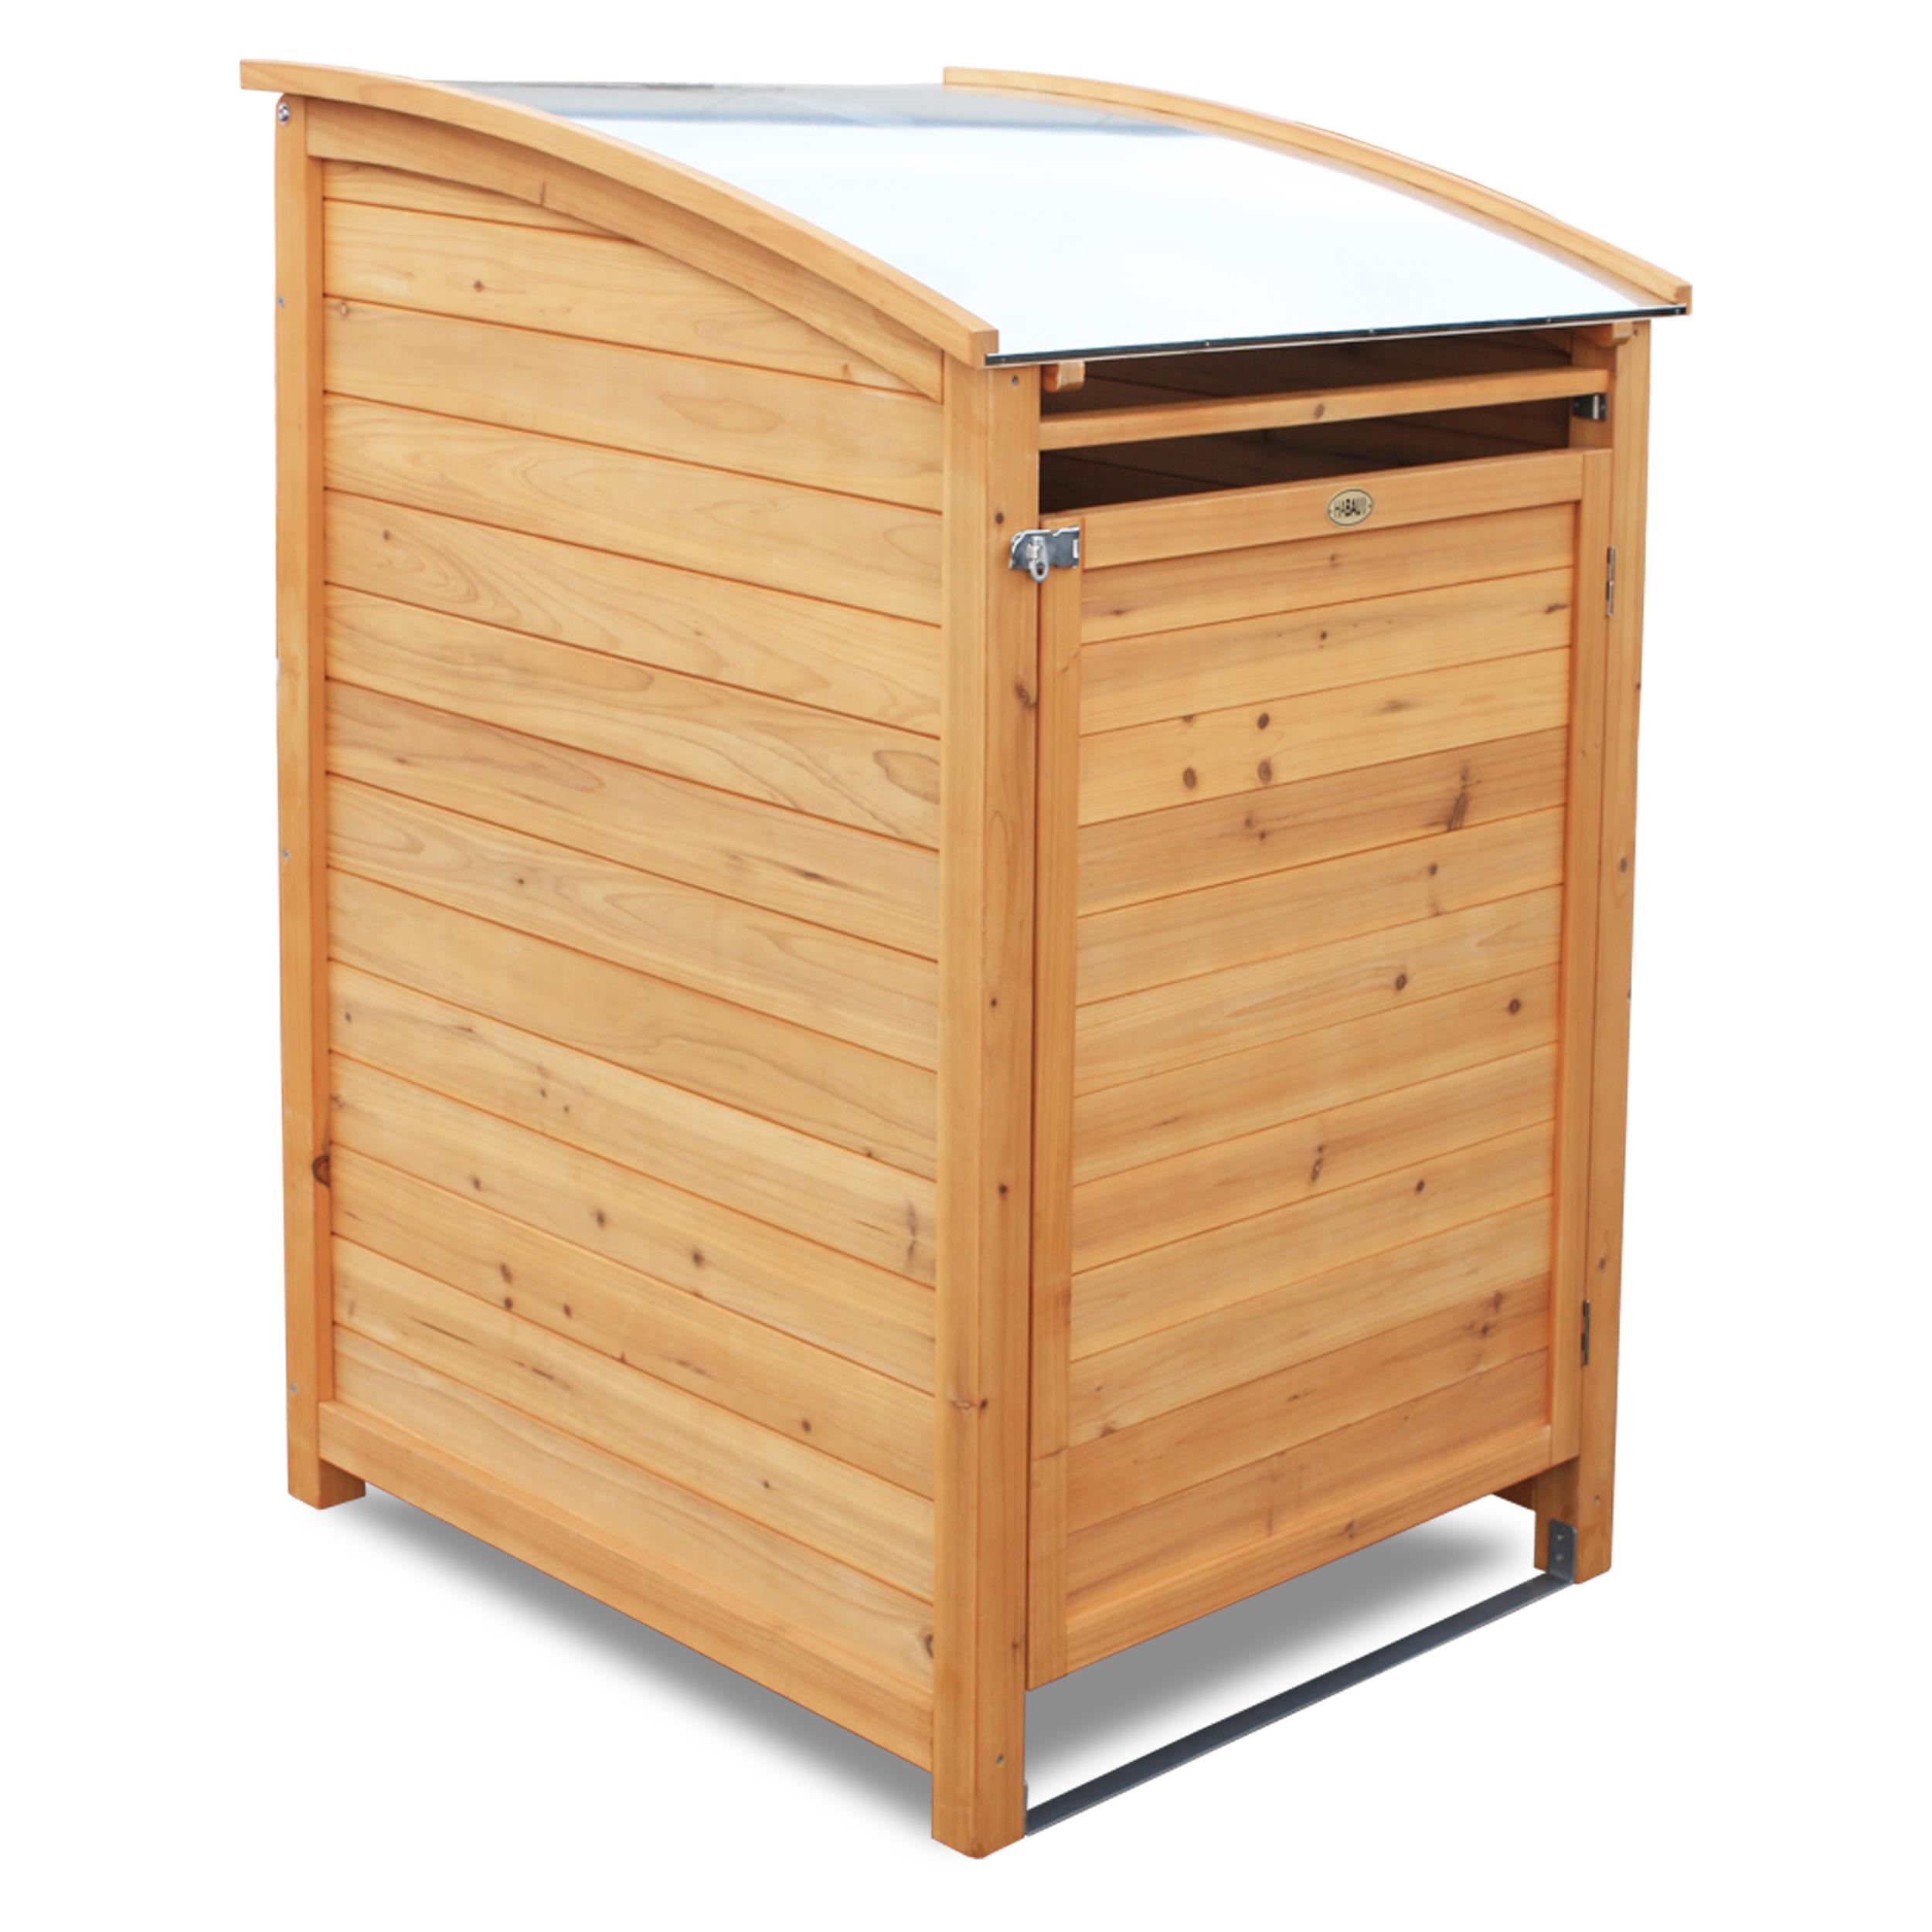 HABAU Mülltonnenbox PLUS 120 Liter, natur - 3152